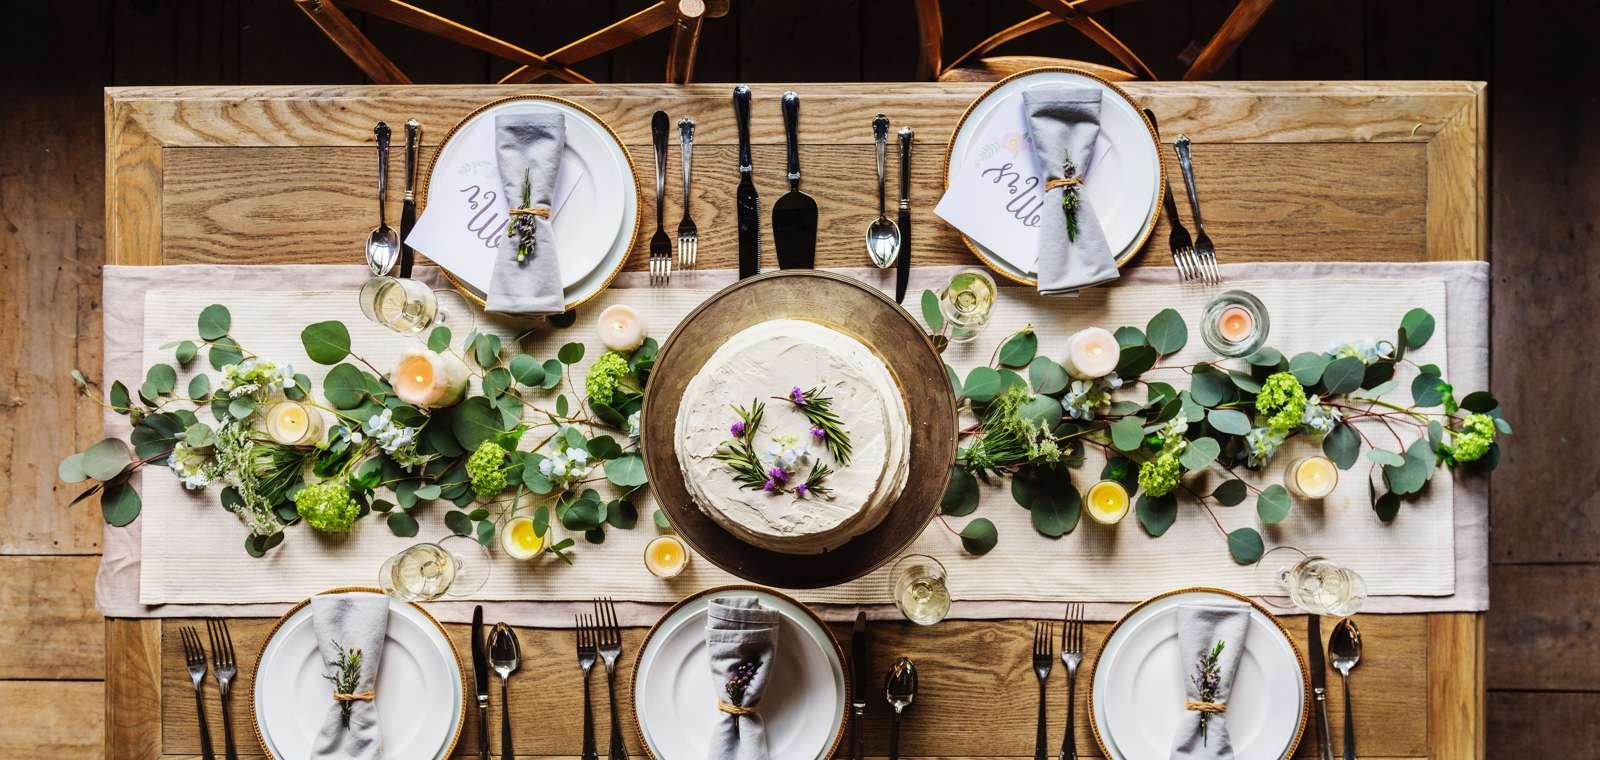 Stock photo of Garden Room table in Topside